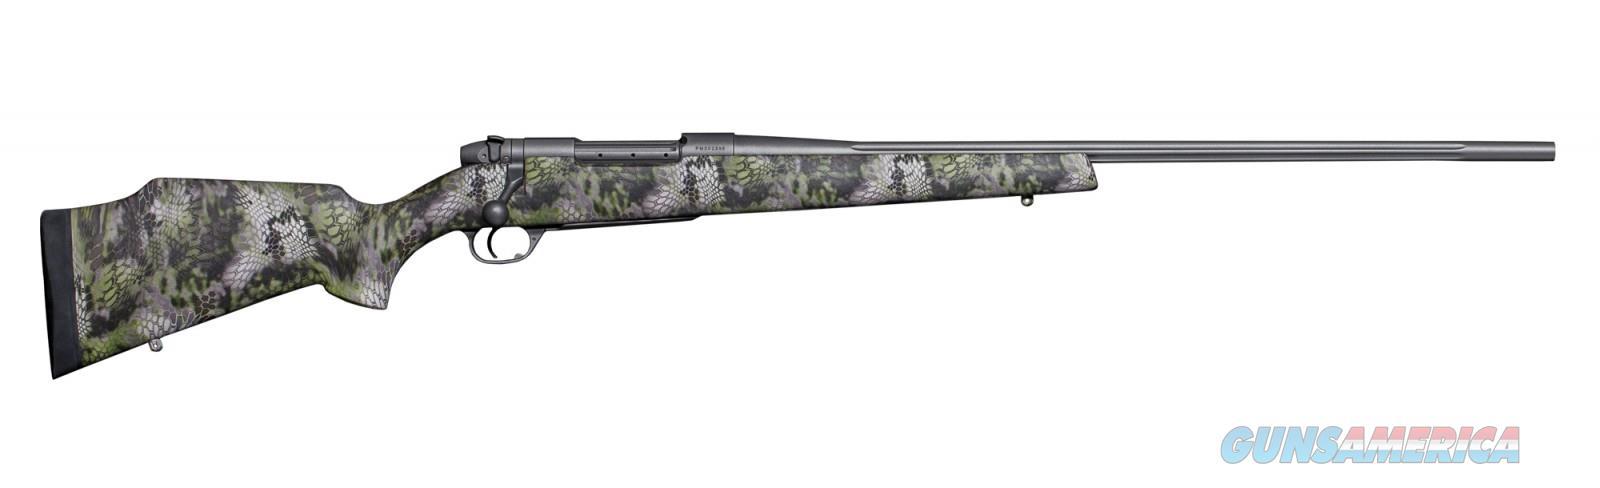 "Weatherby Mark V Kryptek Altitude 22"" 6.5 Creed Tungsten Gray MALS65CMR2O  Guns > Rifles > Weatherby Rifles > Sporting"